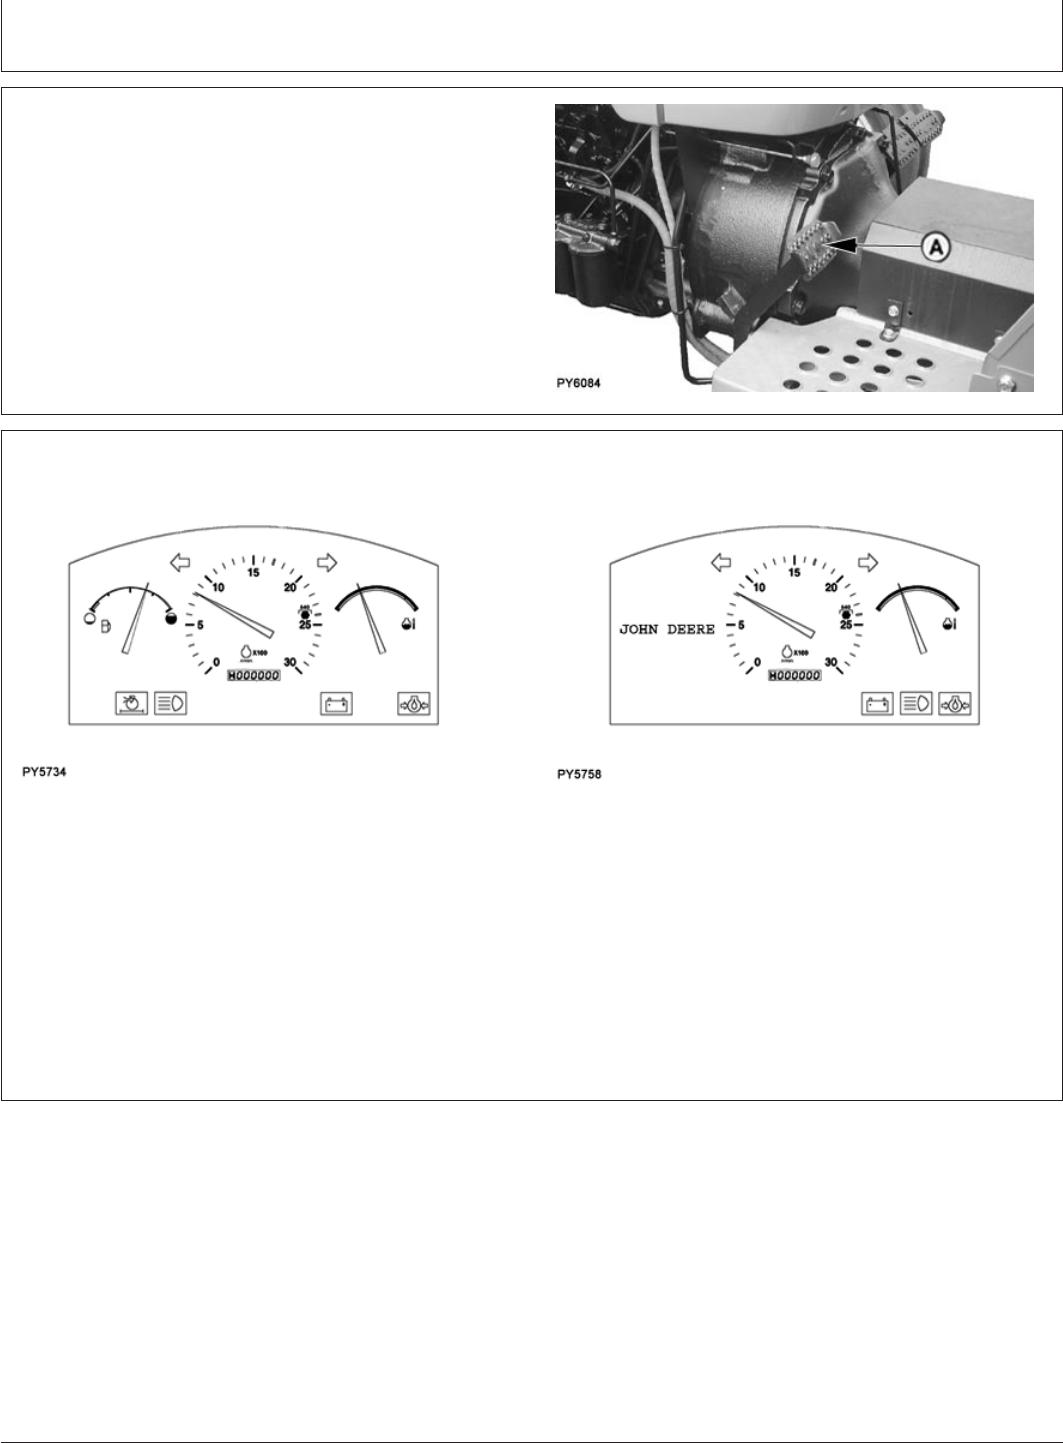 john deere 5103e 5103 5103s 5203 5104 5204 users manual 043025unit on 5203  john deere parts